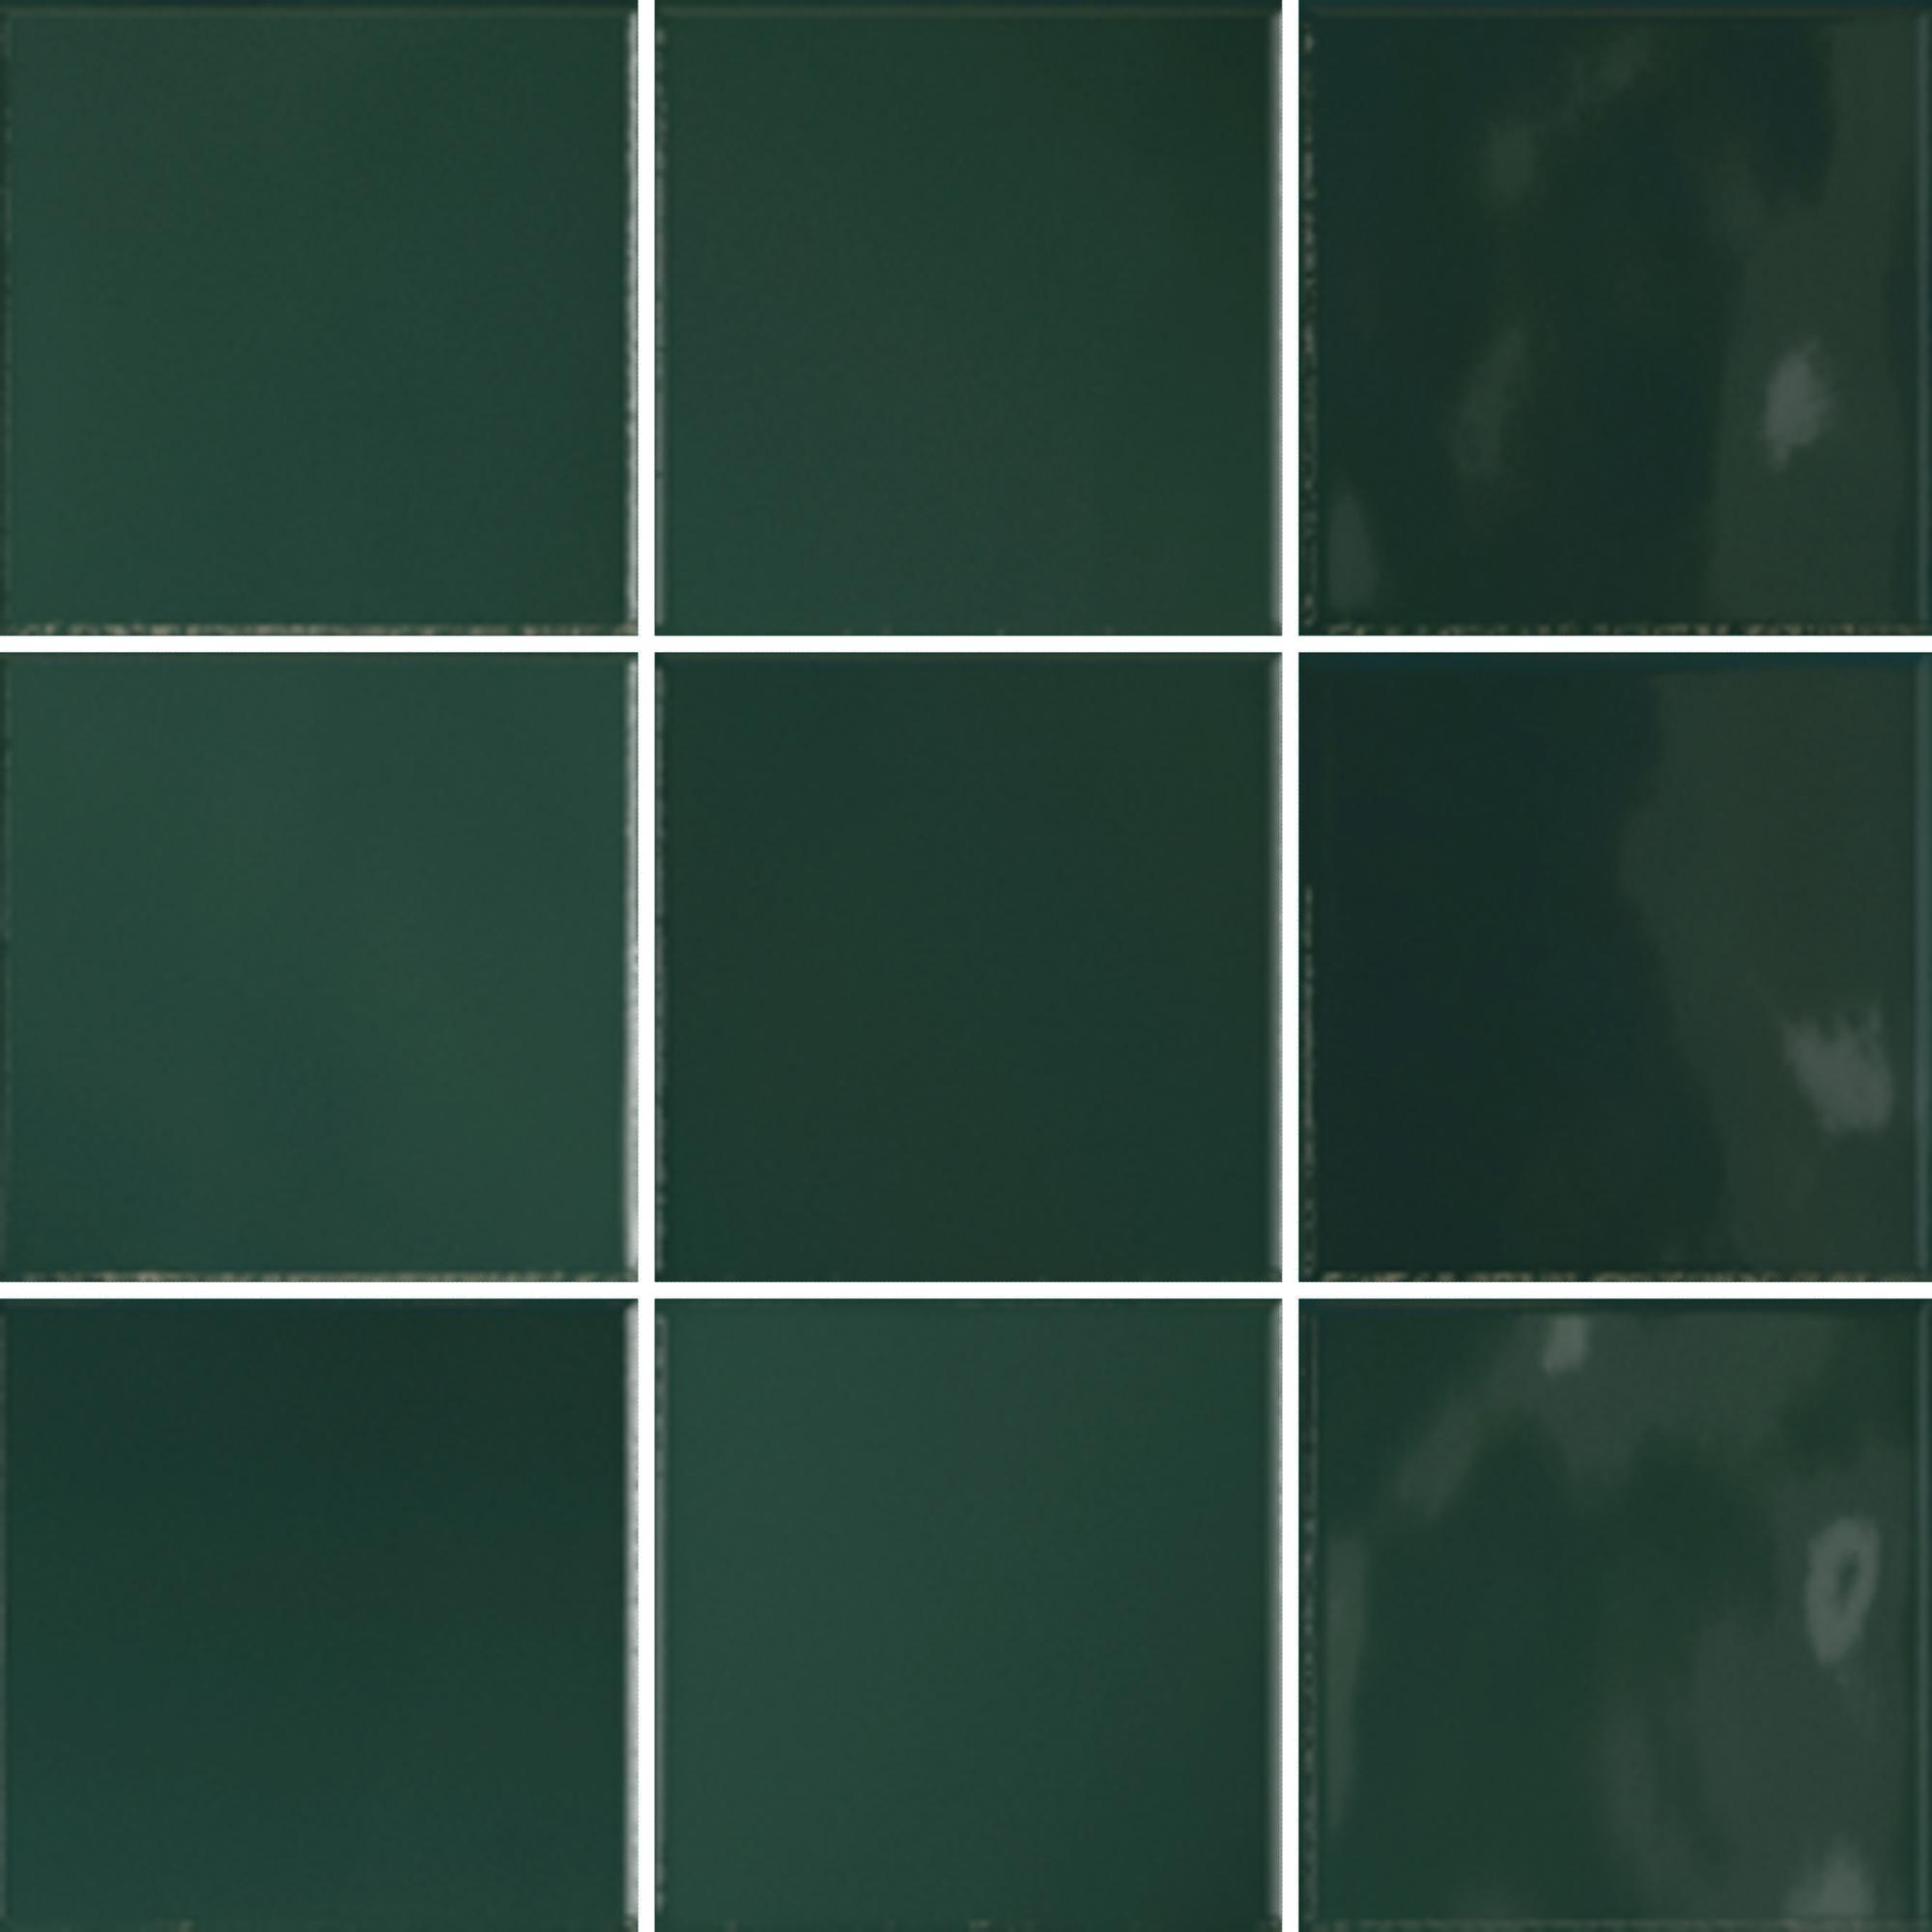 K94842280001VTE0, Retromix, Vihreä, seina